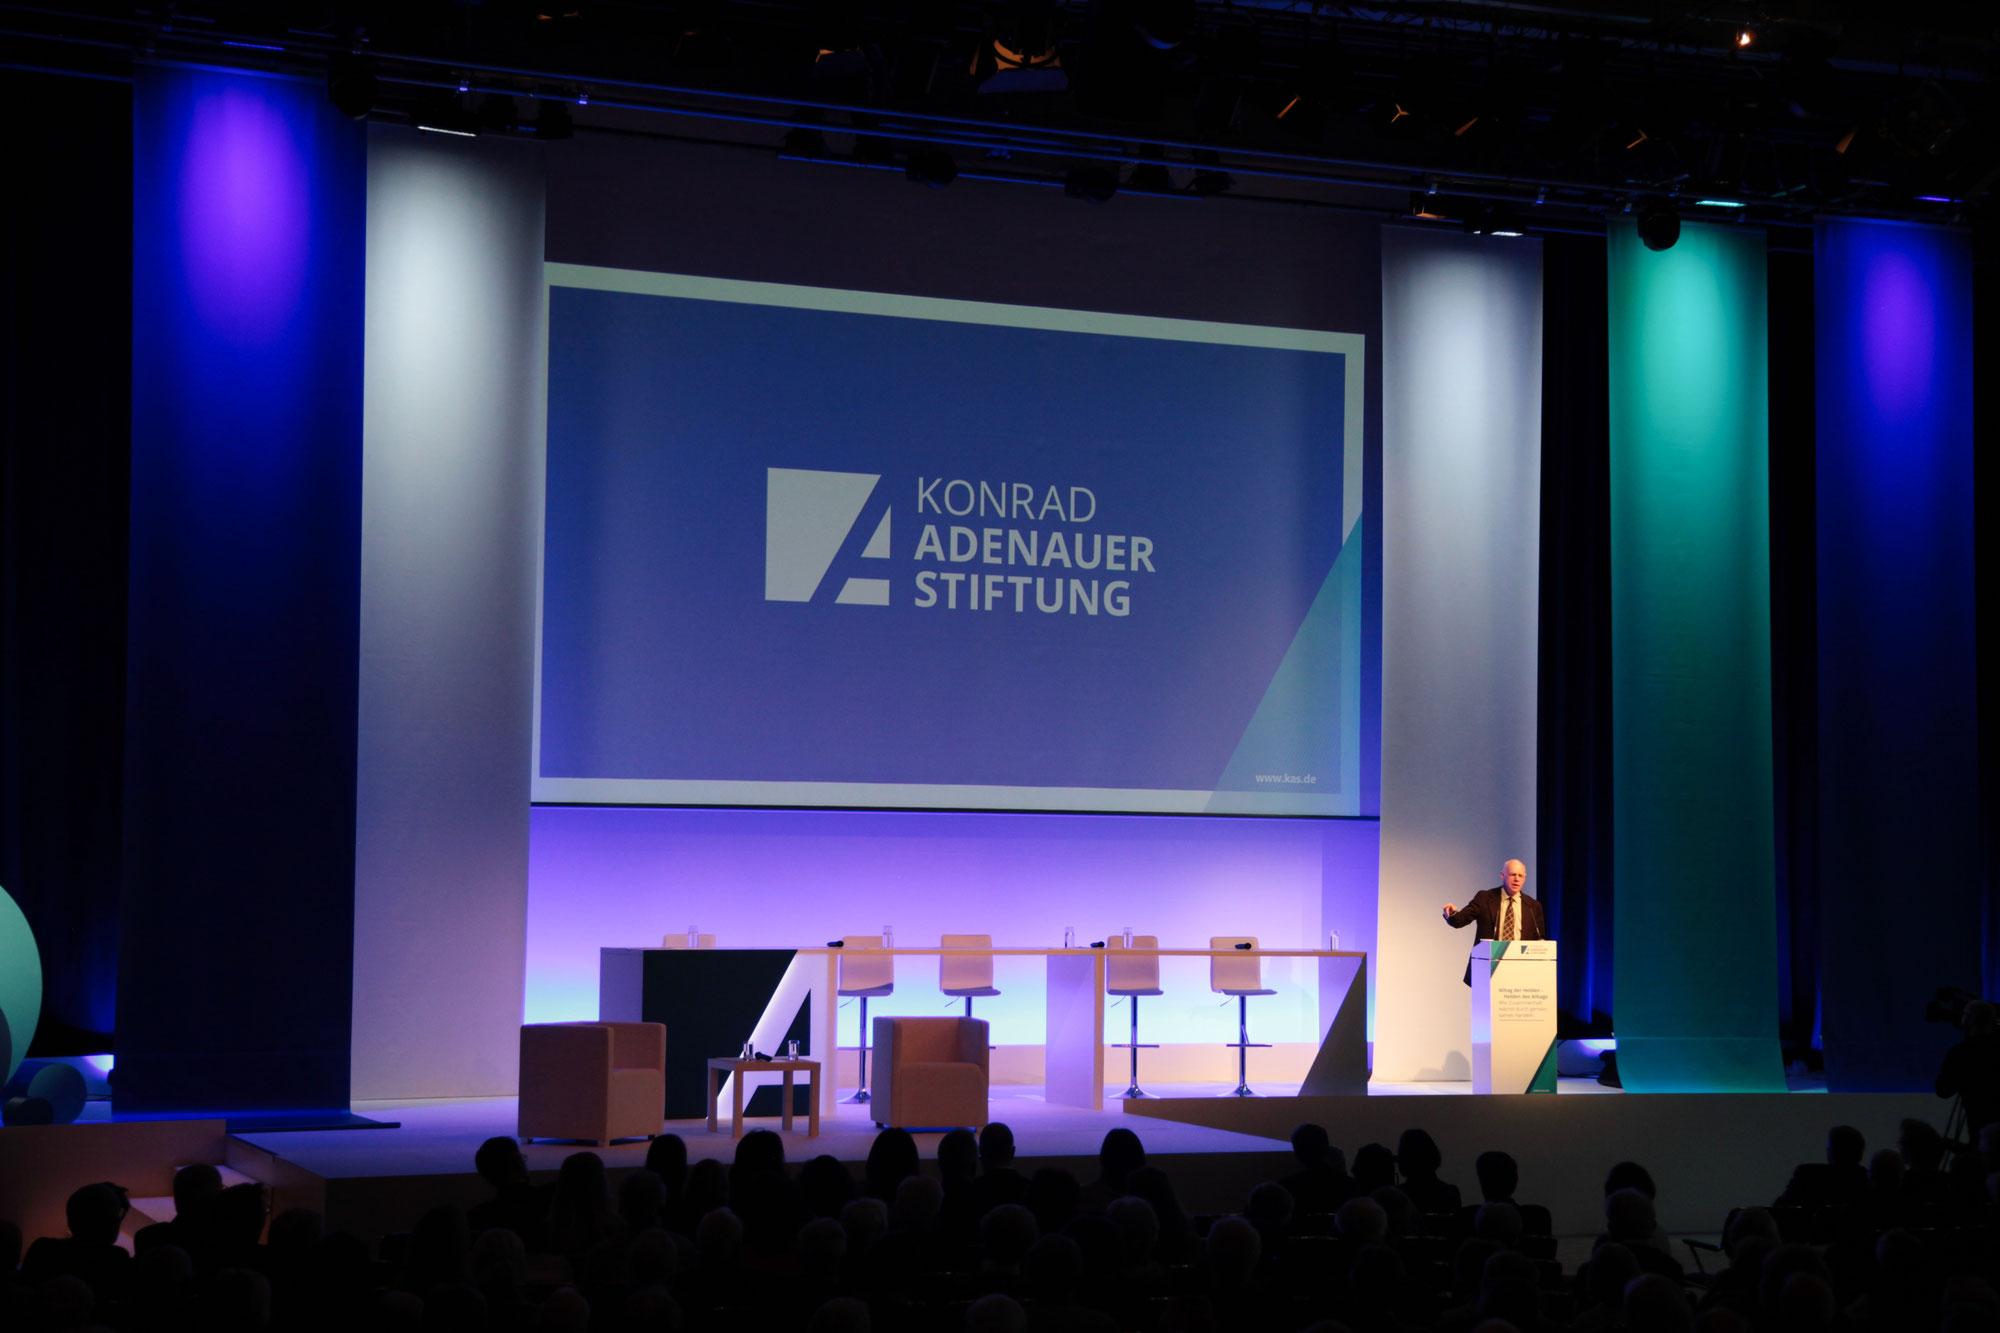 Konrad Adenauer Stiftung - 9. Demokratie-Kongress